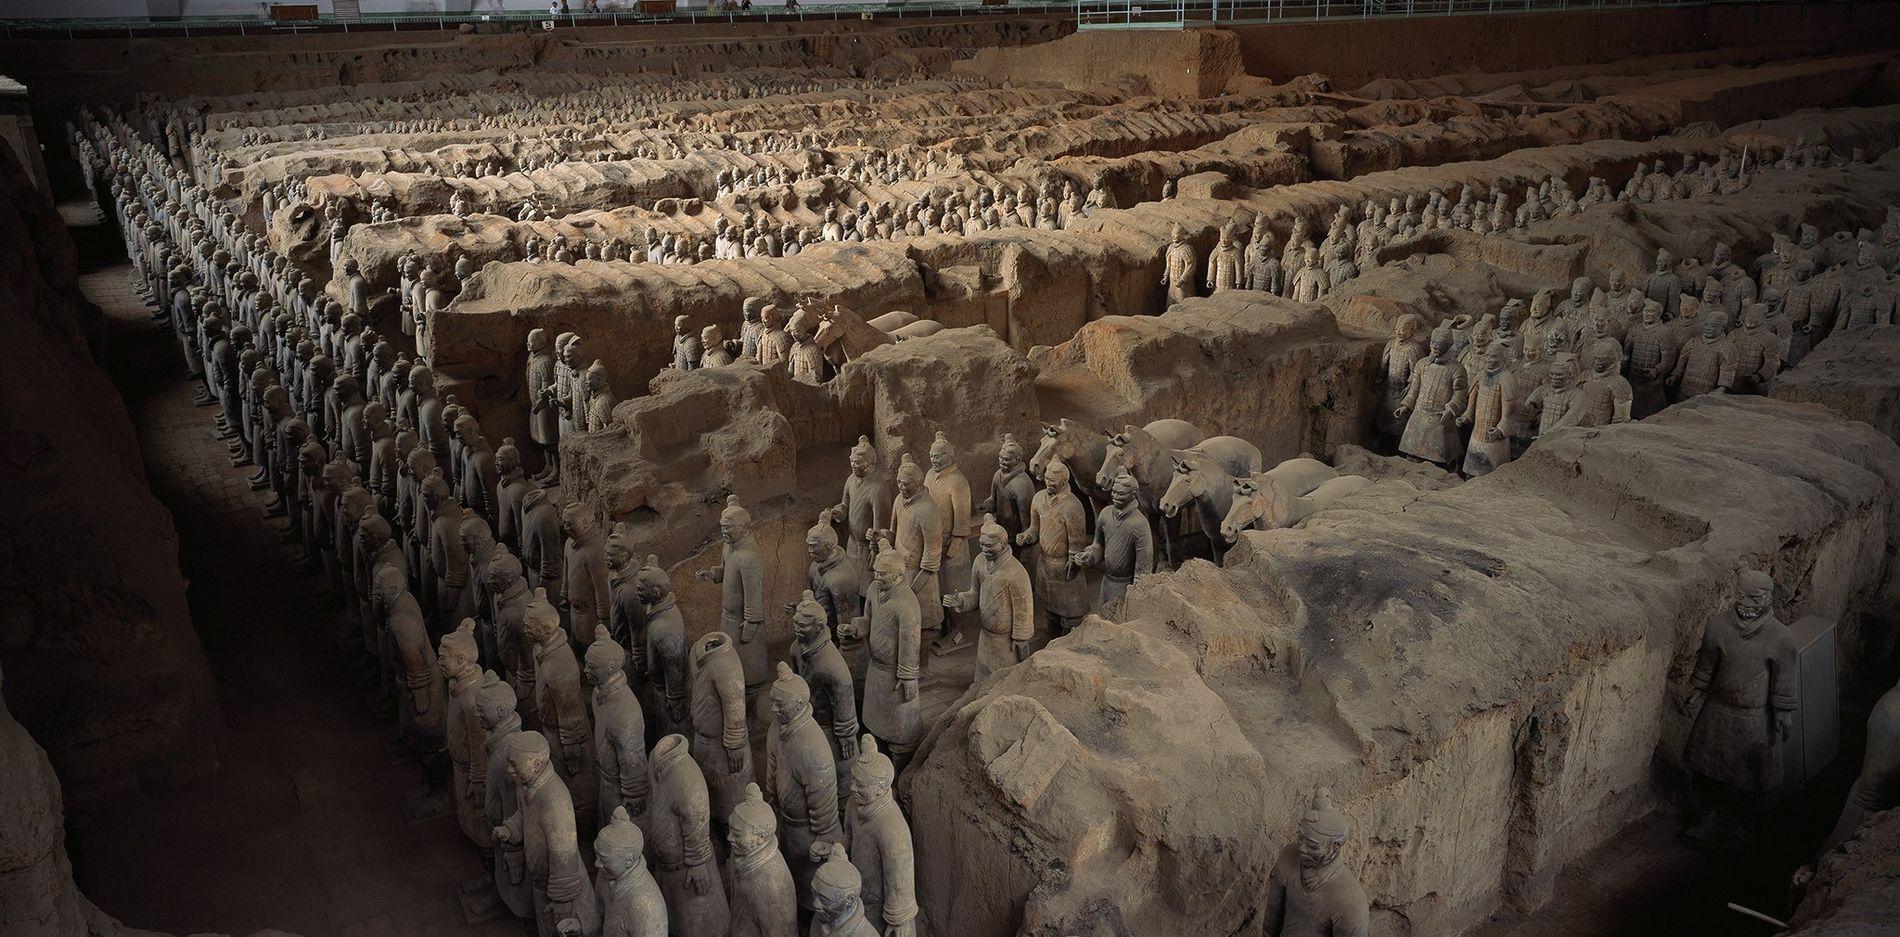 01-China-Emperor-Tomb-Terracotta